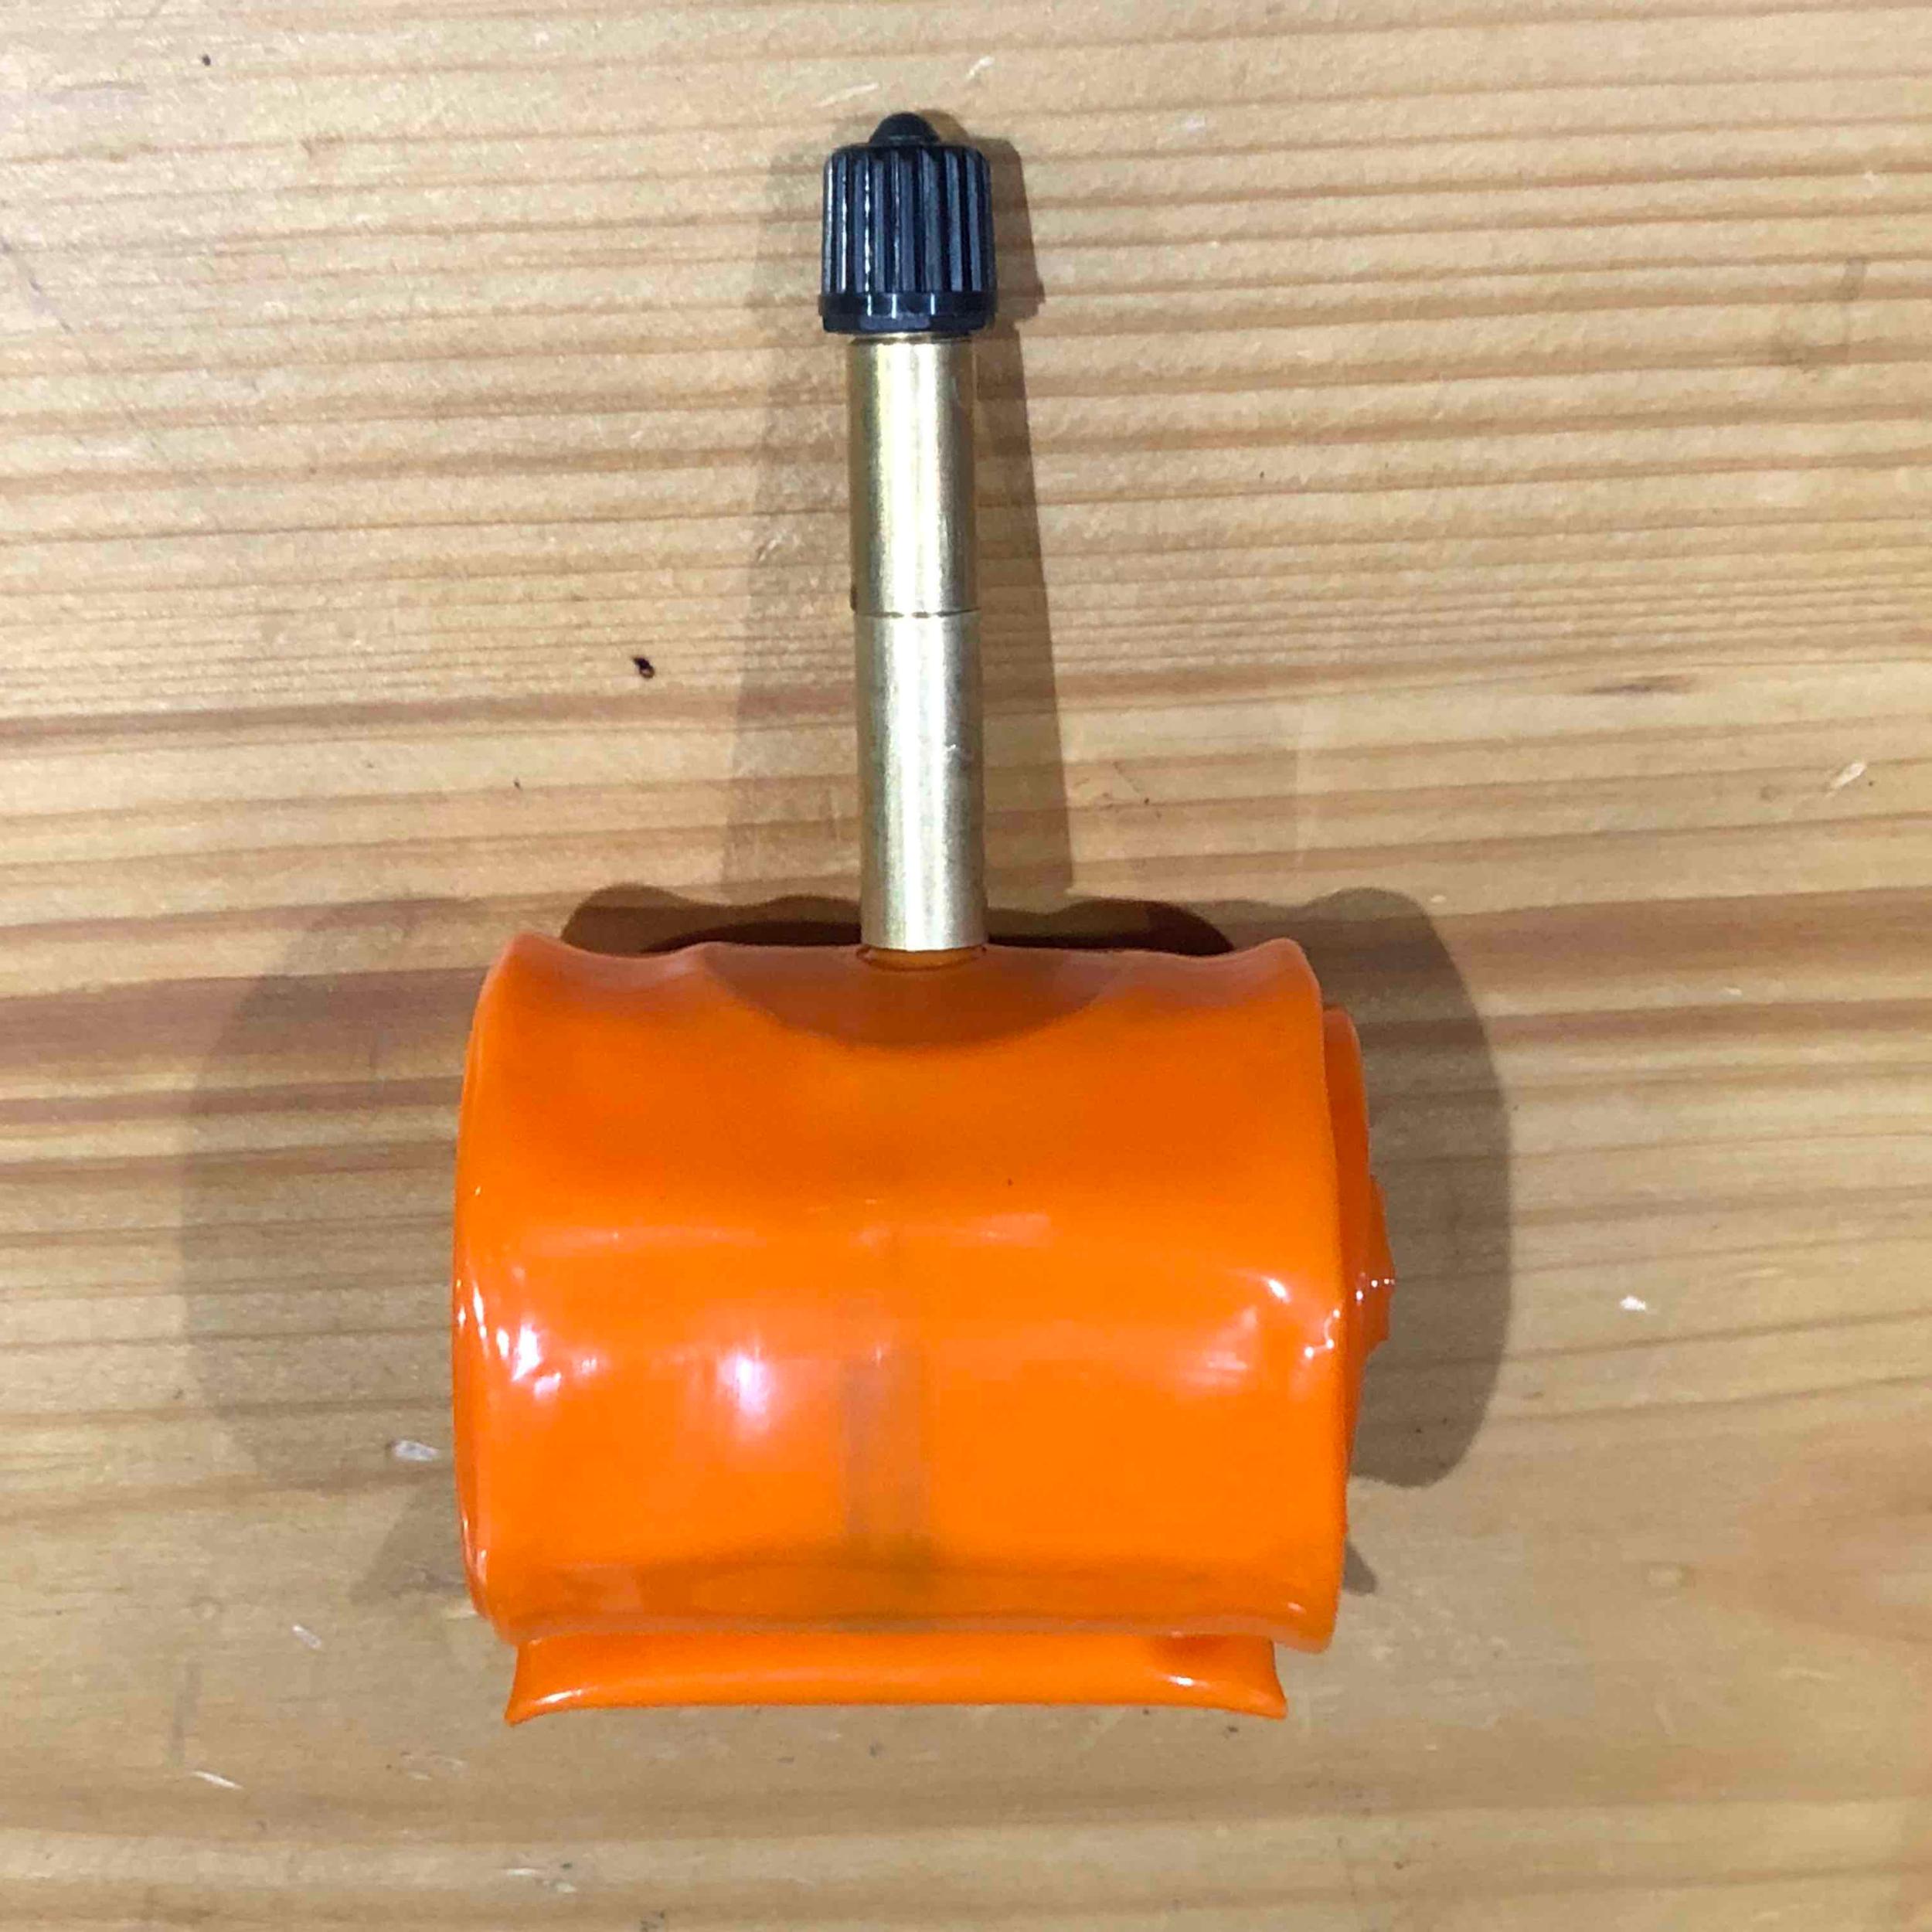 CHAMBRE À AIR TUBOLITO TUBO LITE 20 X 1.80 - 2.40